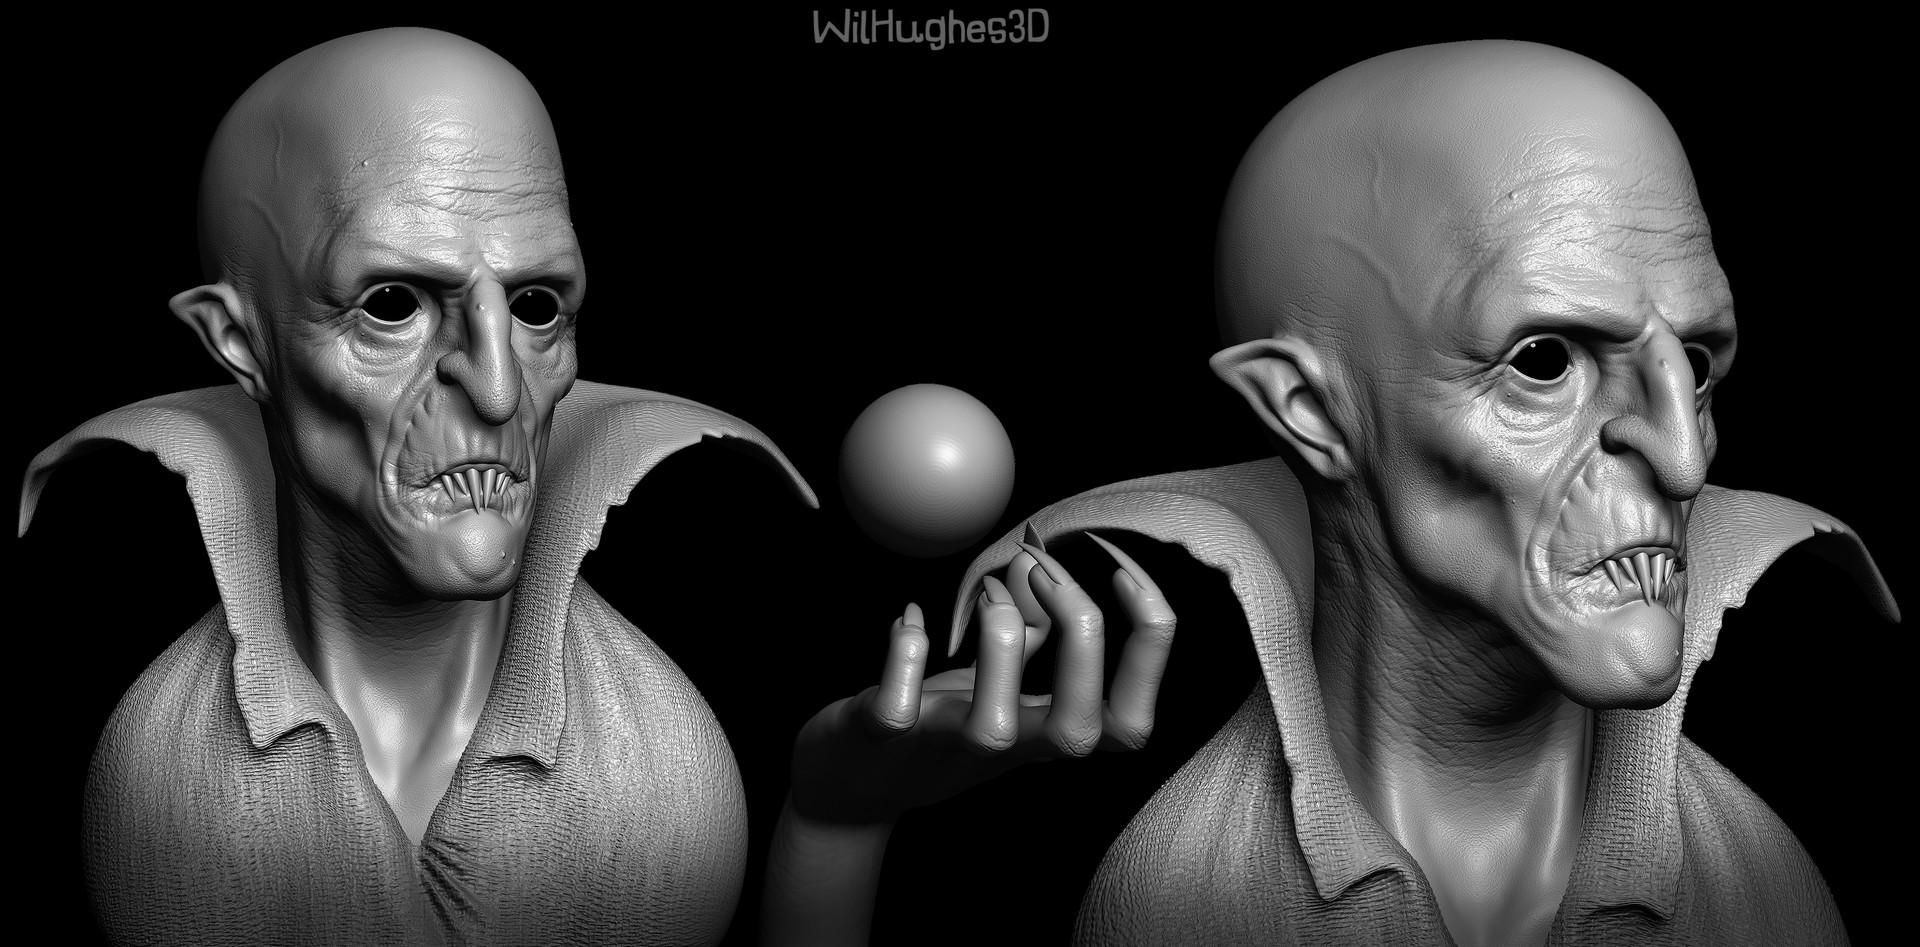 Wil hughes vampire sculpture